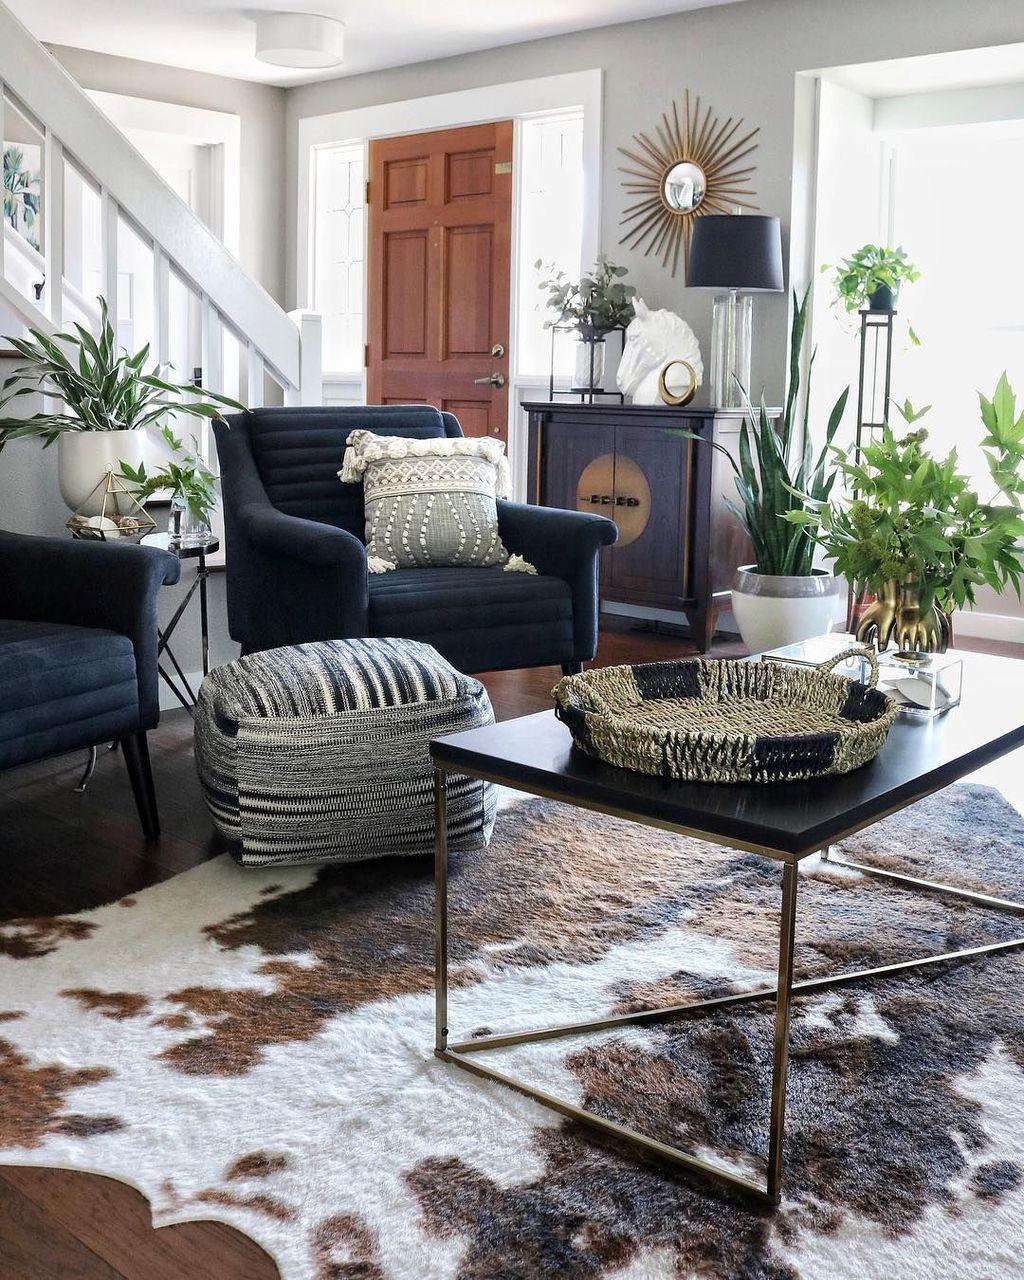 30 Fabulous Cowhide Rug Living Room Decor Ideas Cowhide Rug Living Room Hide Rug Living Room Rugs In Living Room